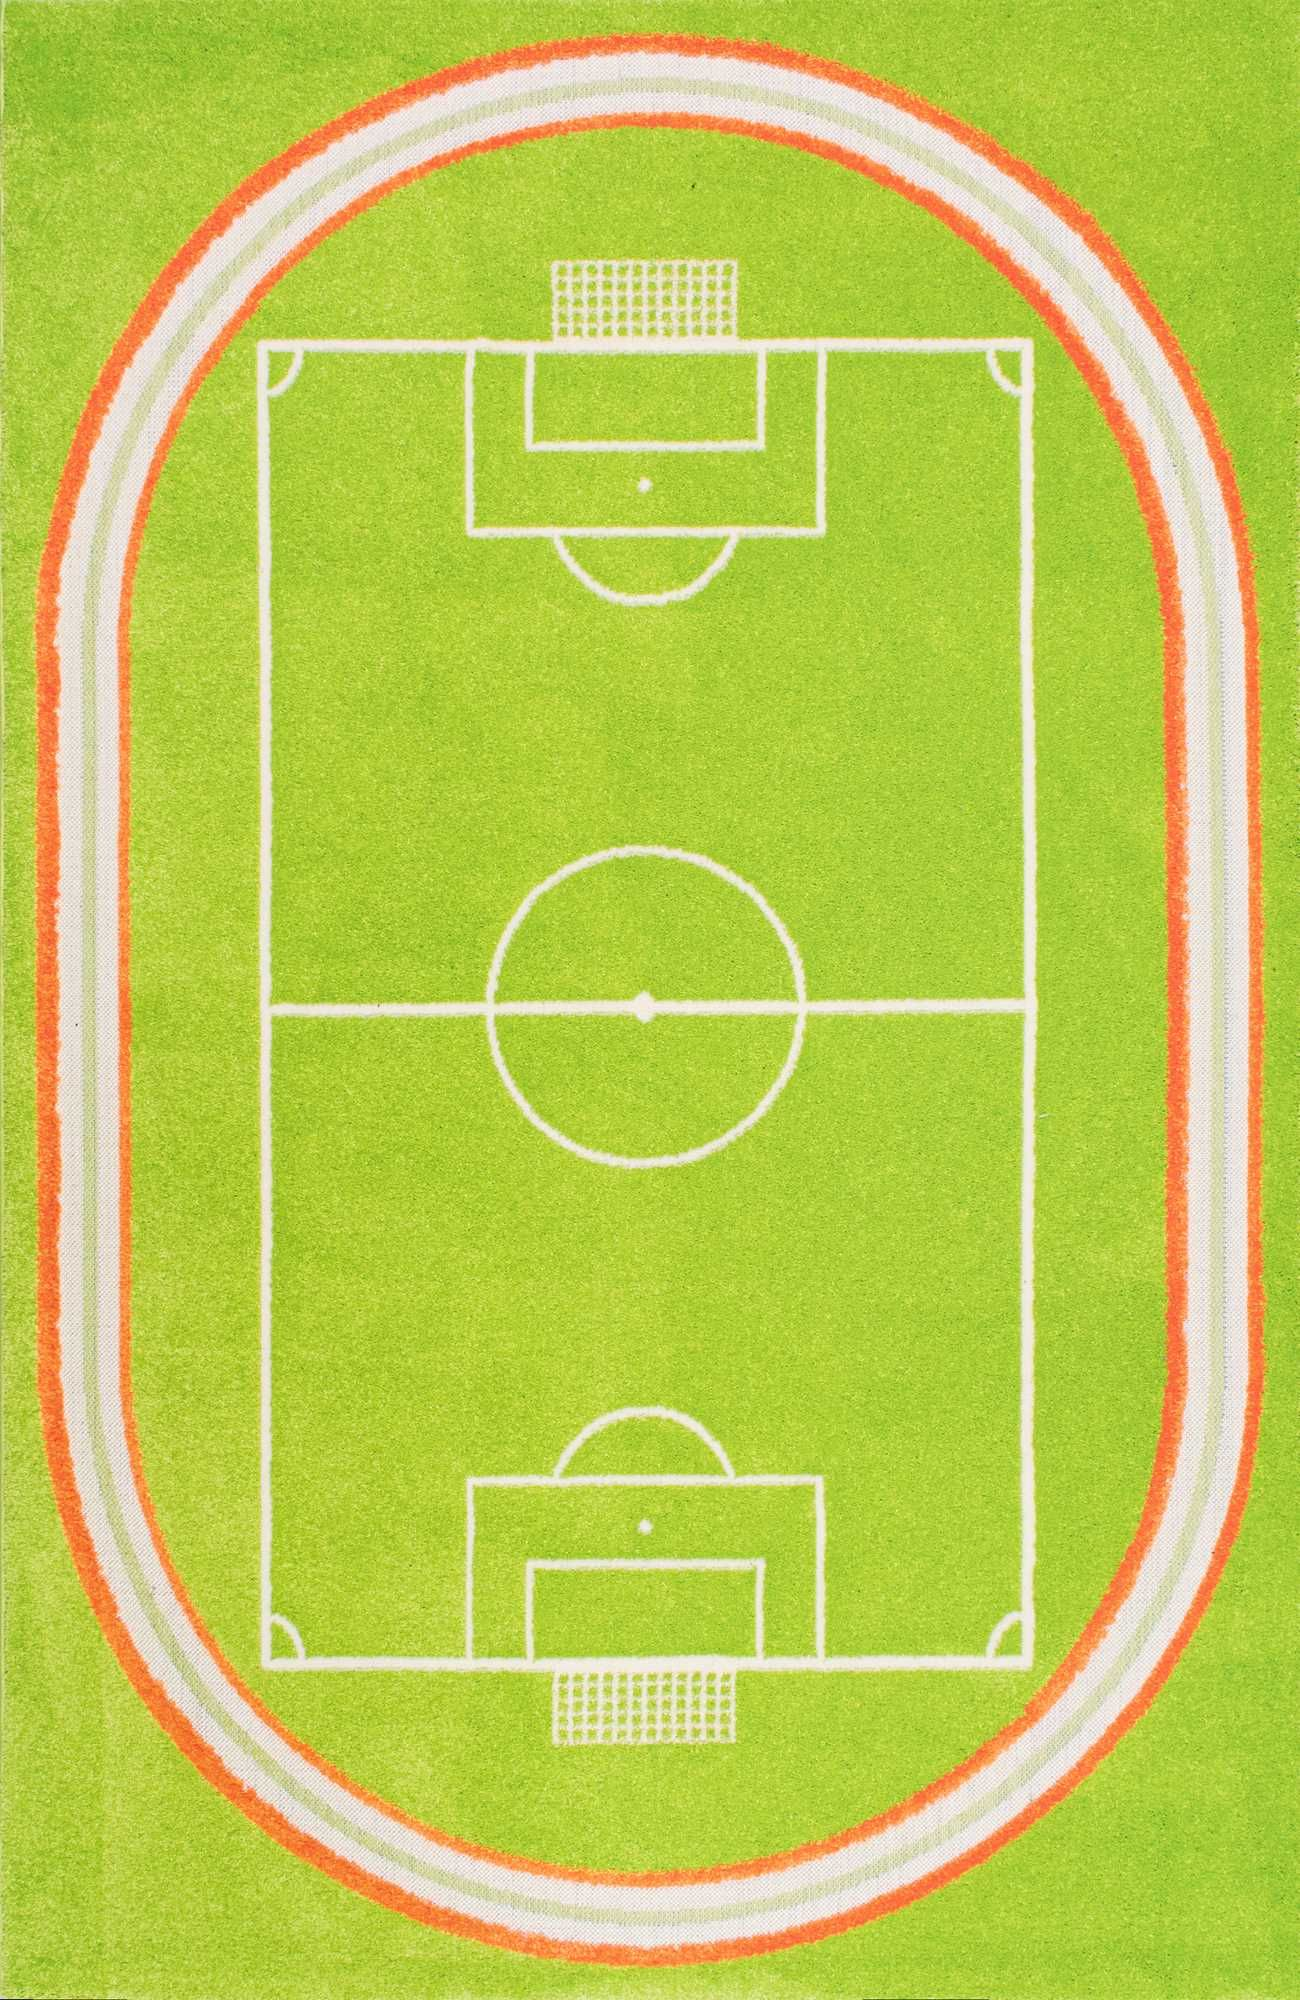 Kids Zone Playtime Kw03 Miniature Soccer Field Rug